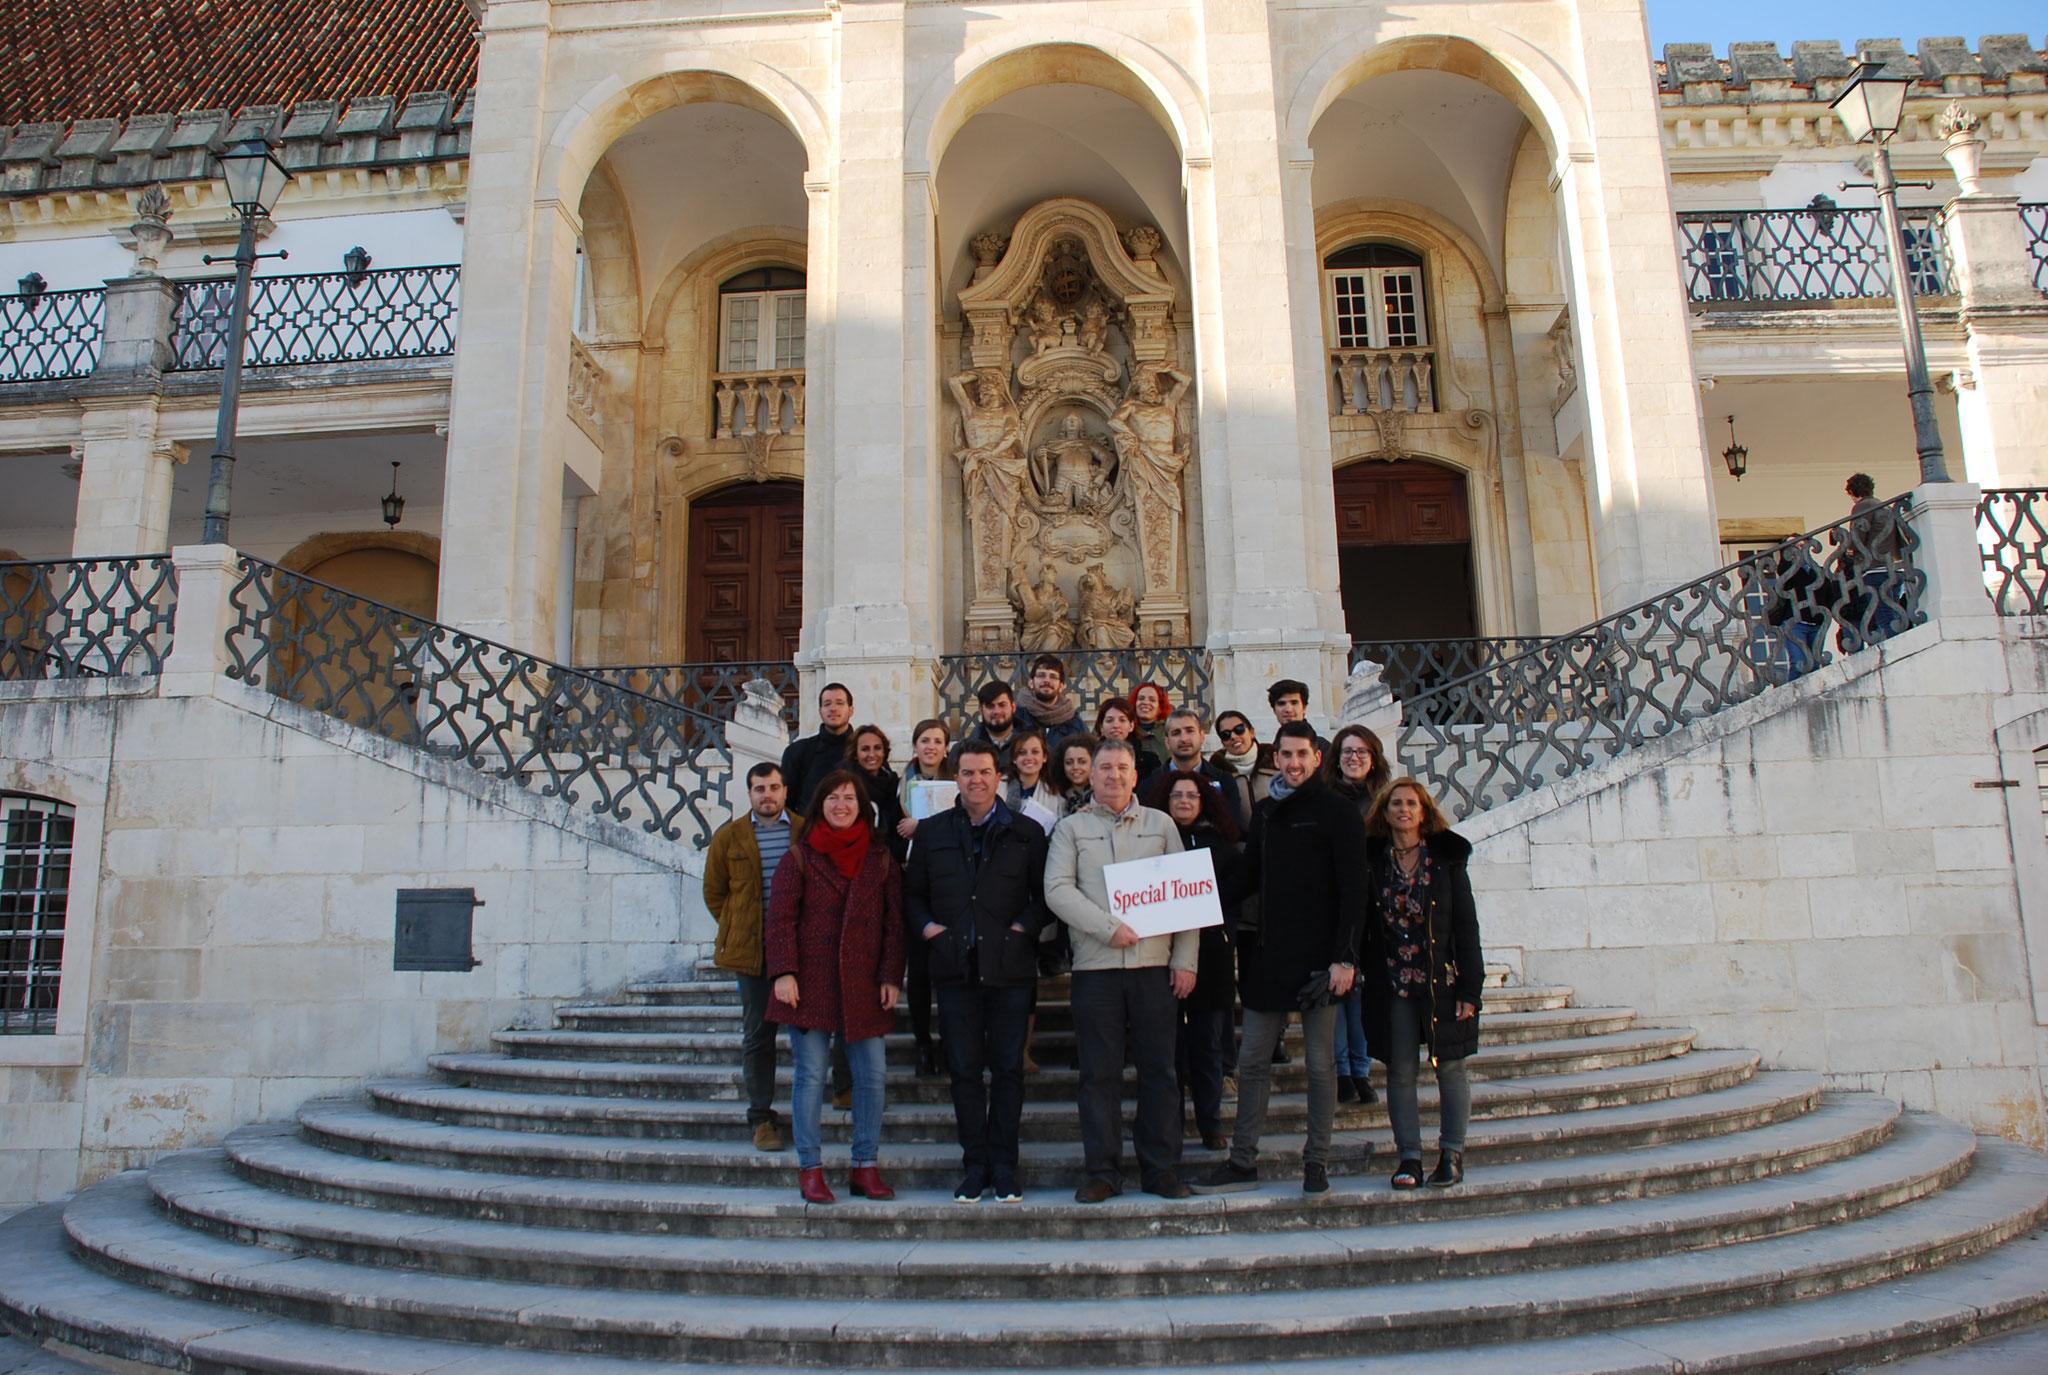 2016. Universidad de Coimbra